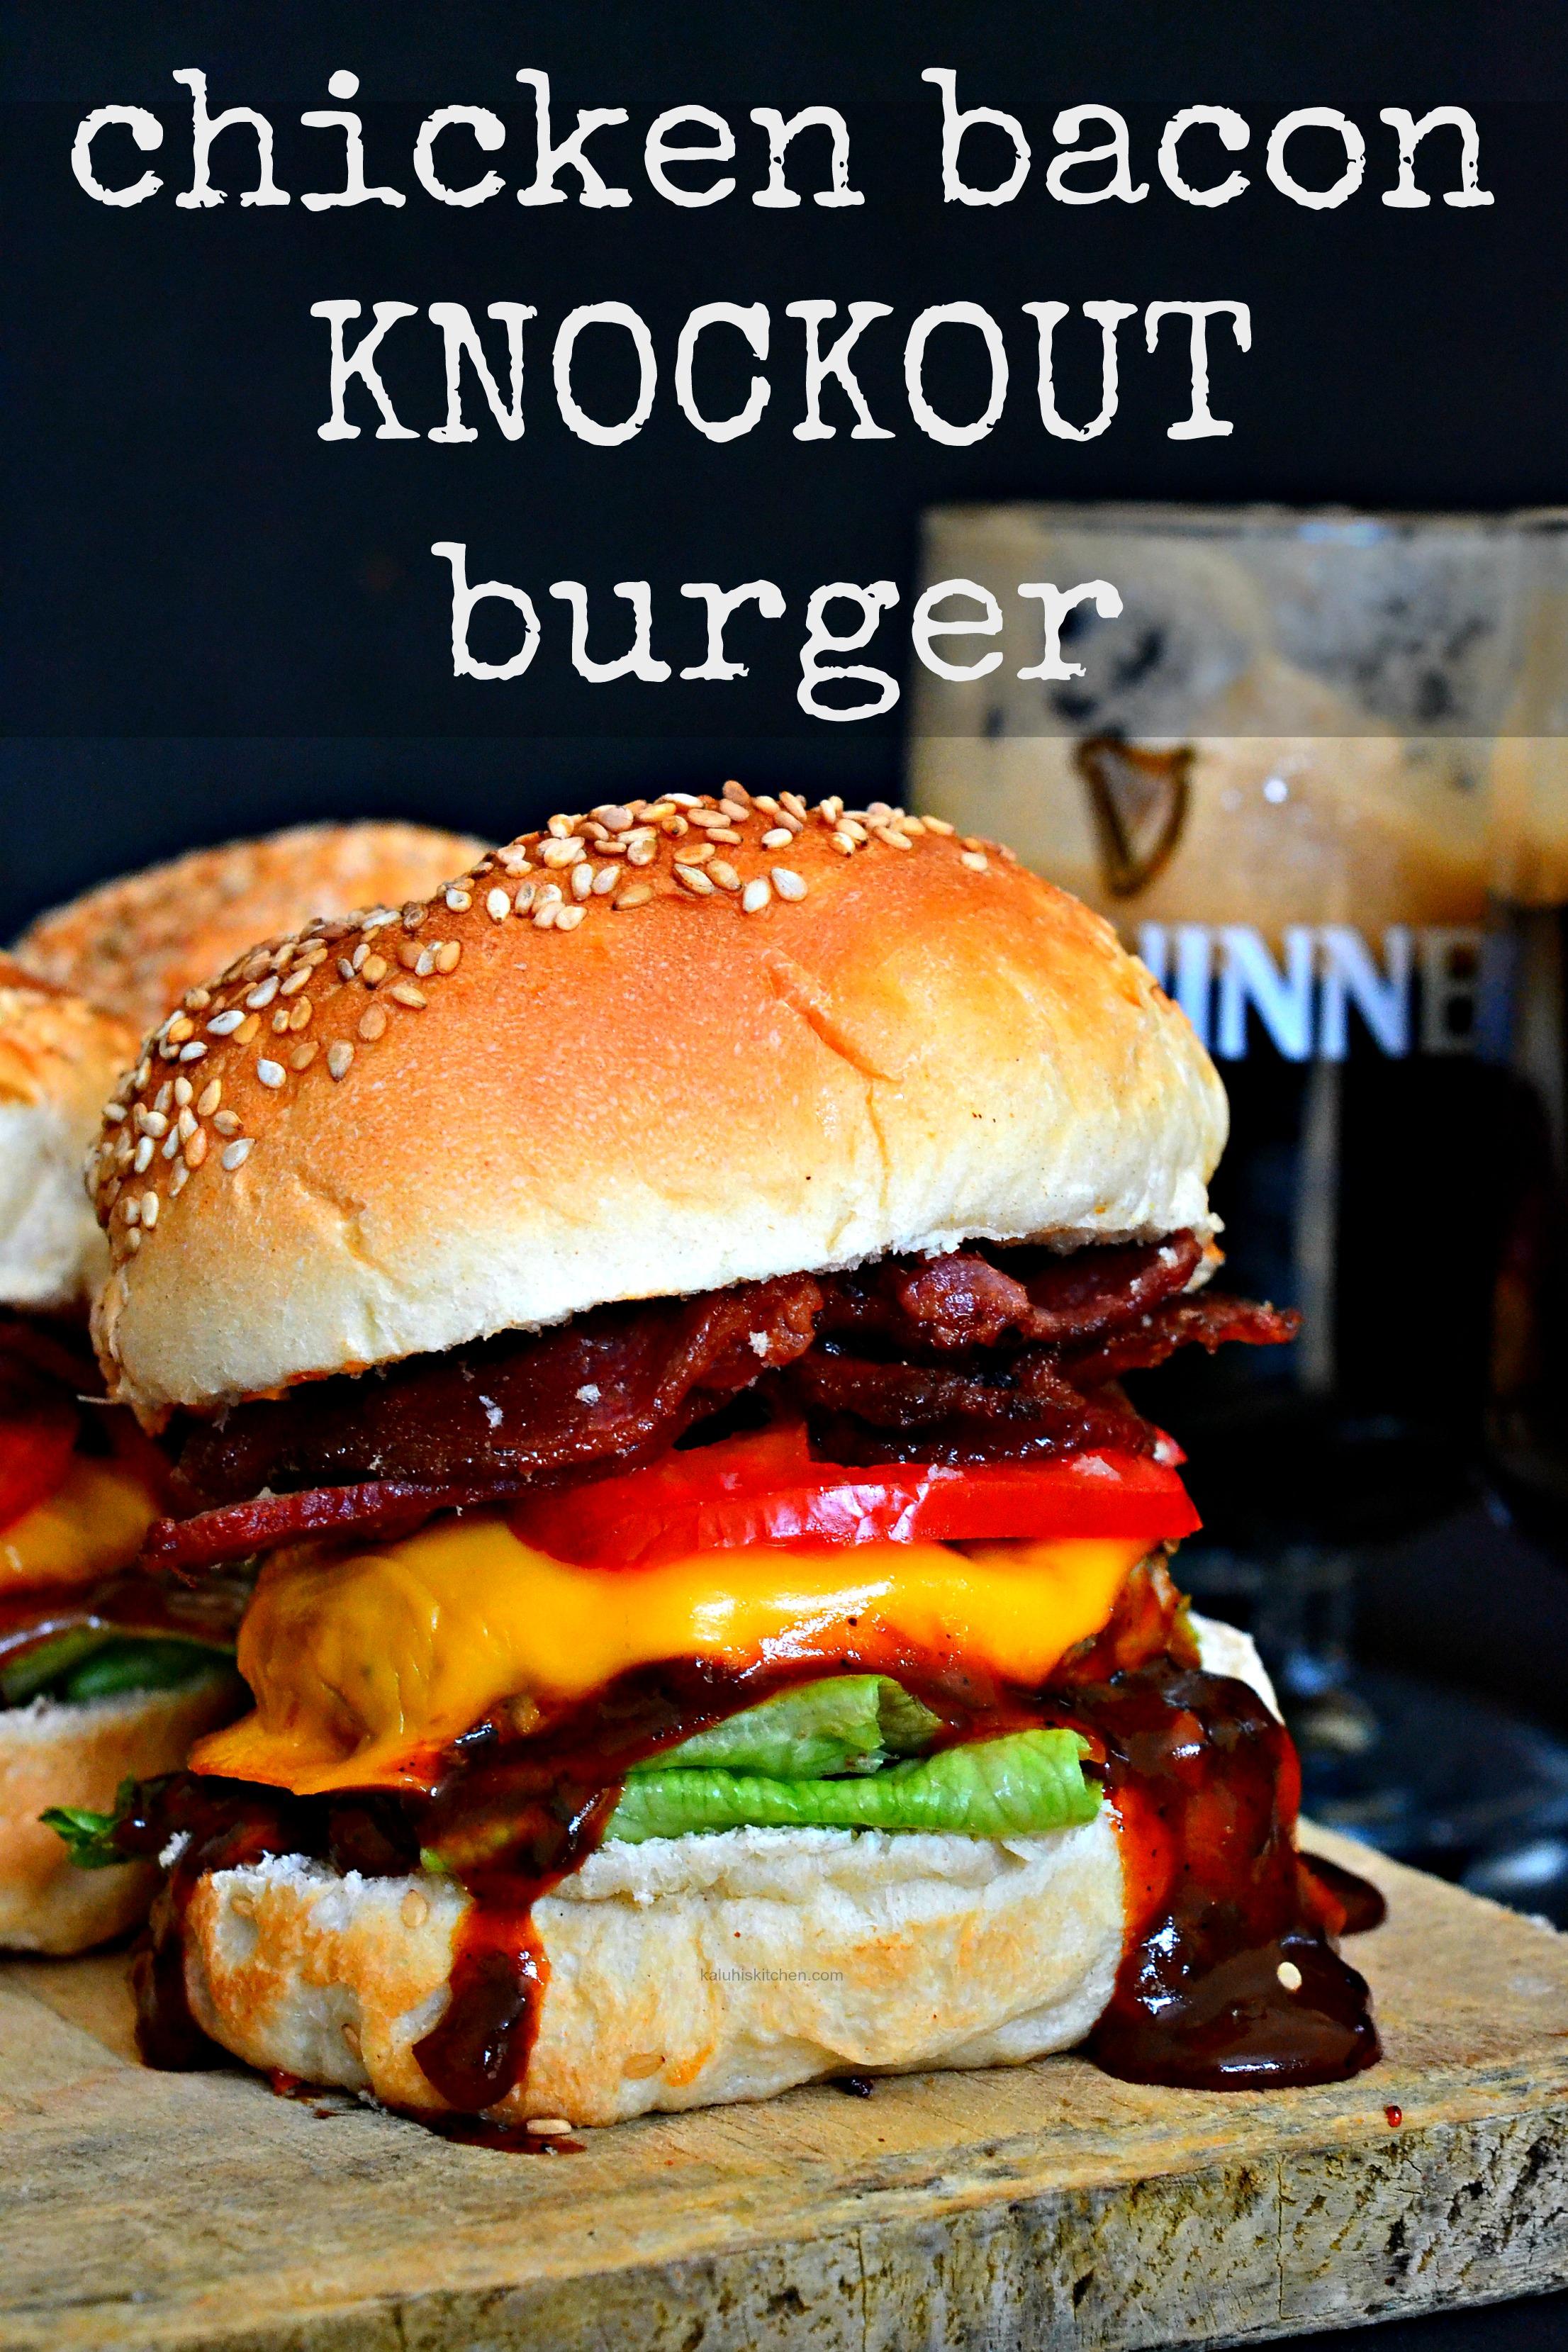 chicken-bacon-knockout-burger_kaluhiskitchen-com_kaluhiskitchen-recipes_best-kenyan-food-blog_best-african-food-blog